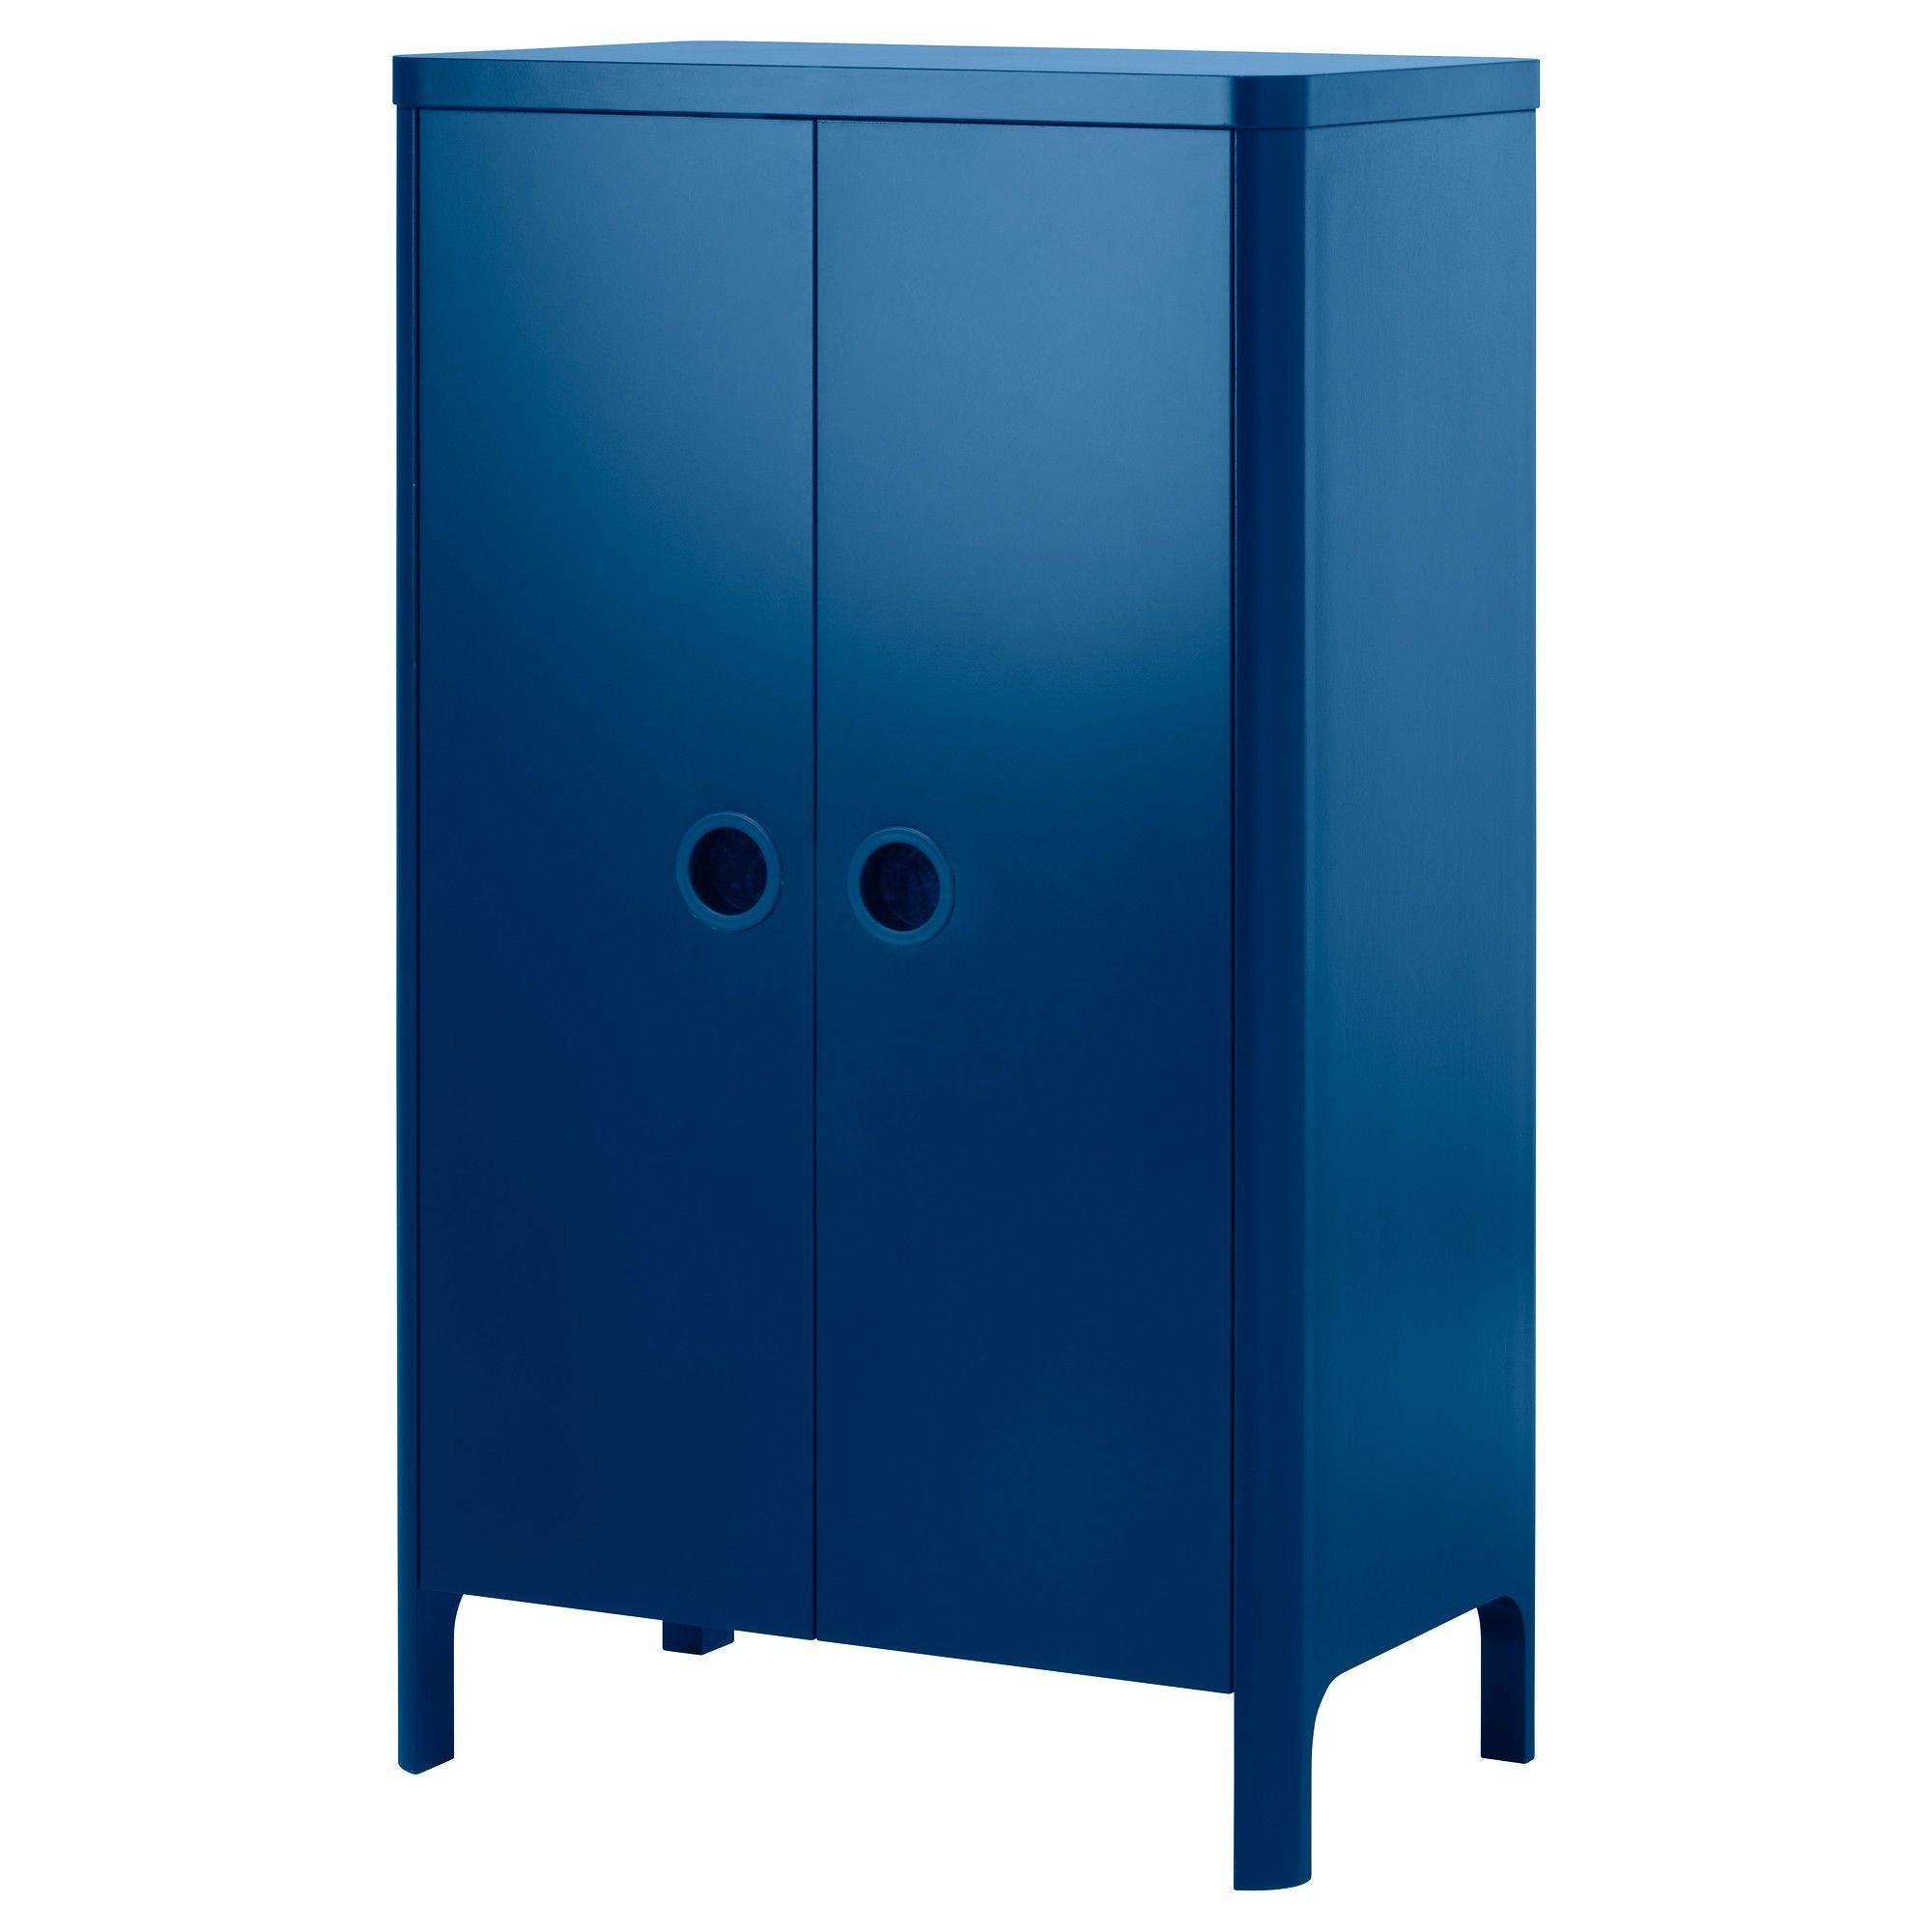 Ikea Us Furniture And Home Furnishings Childrens Storage Furniture Ikea Plastic Storage Drawers